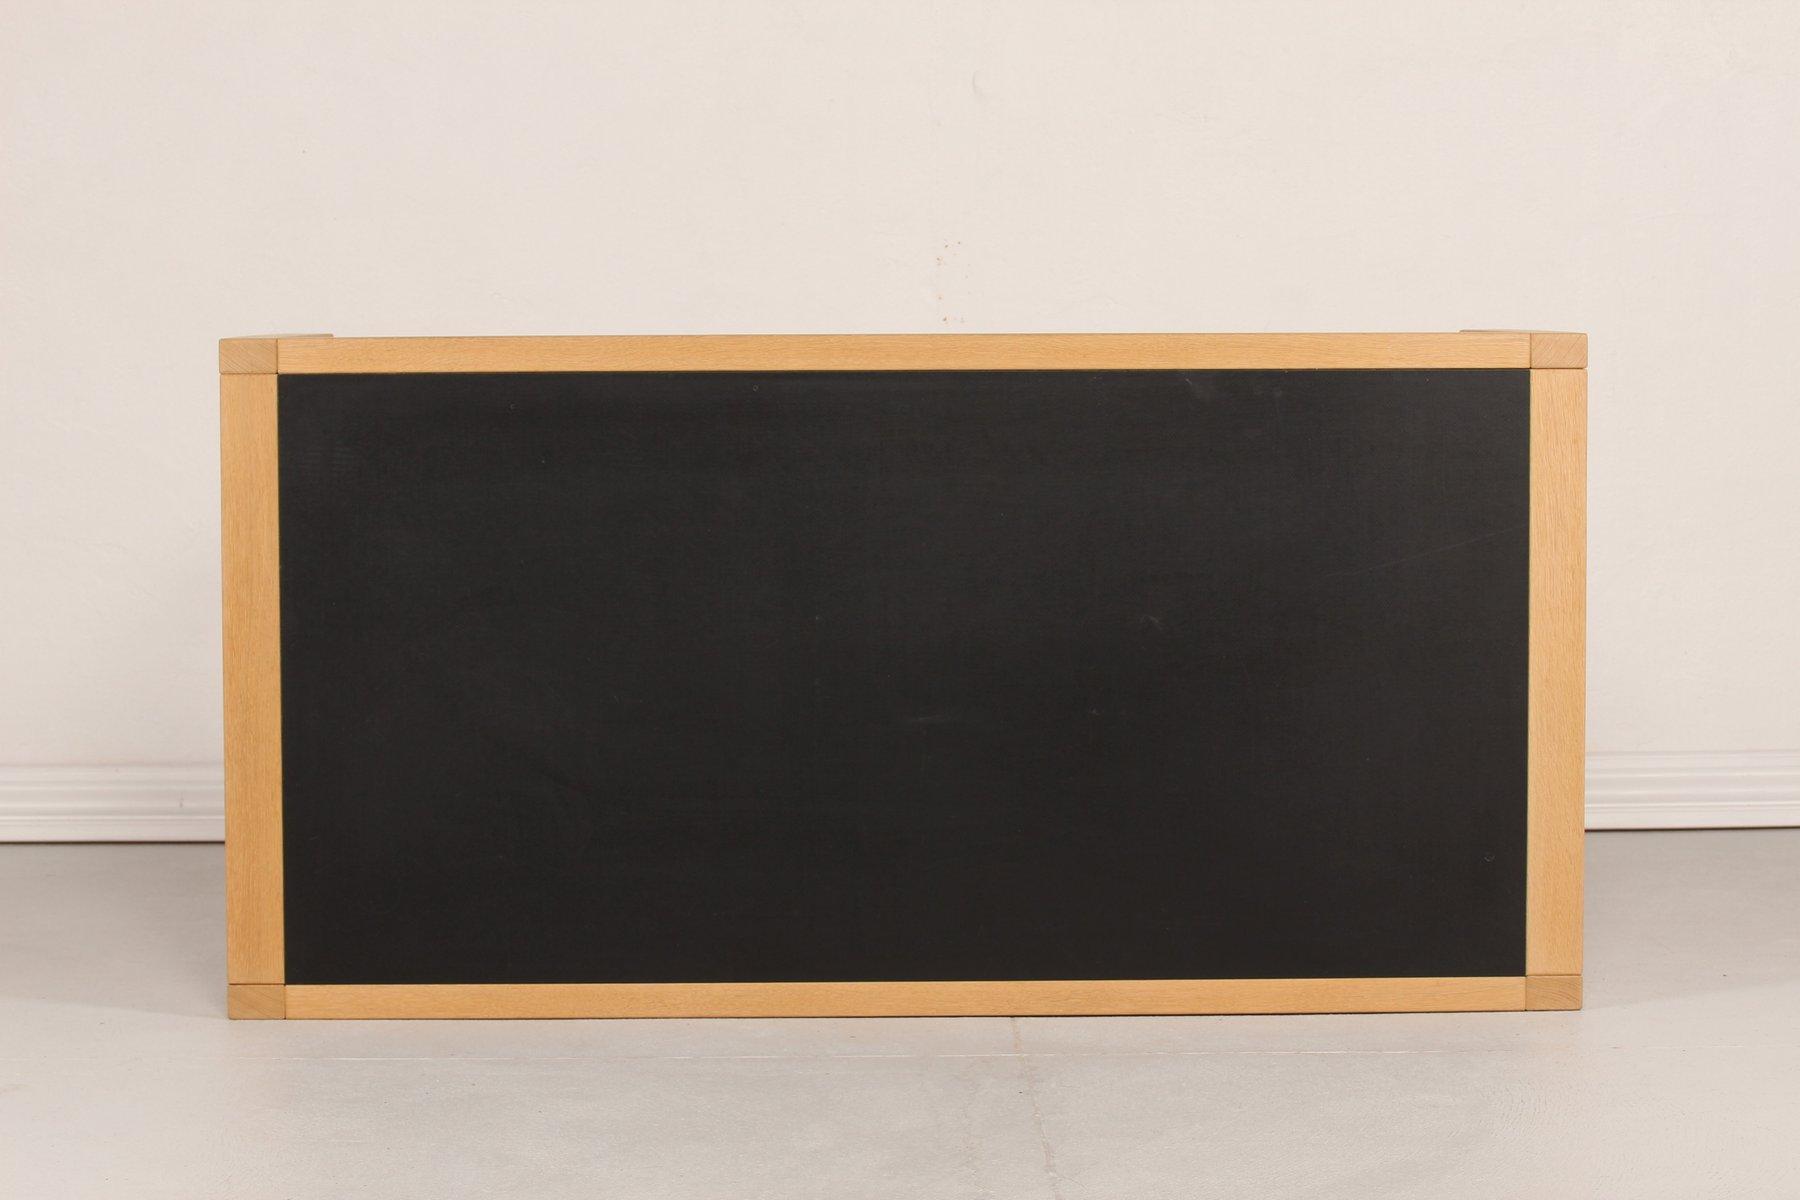 Tischplatte mit linoleum finest copenhague desk cph avec